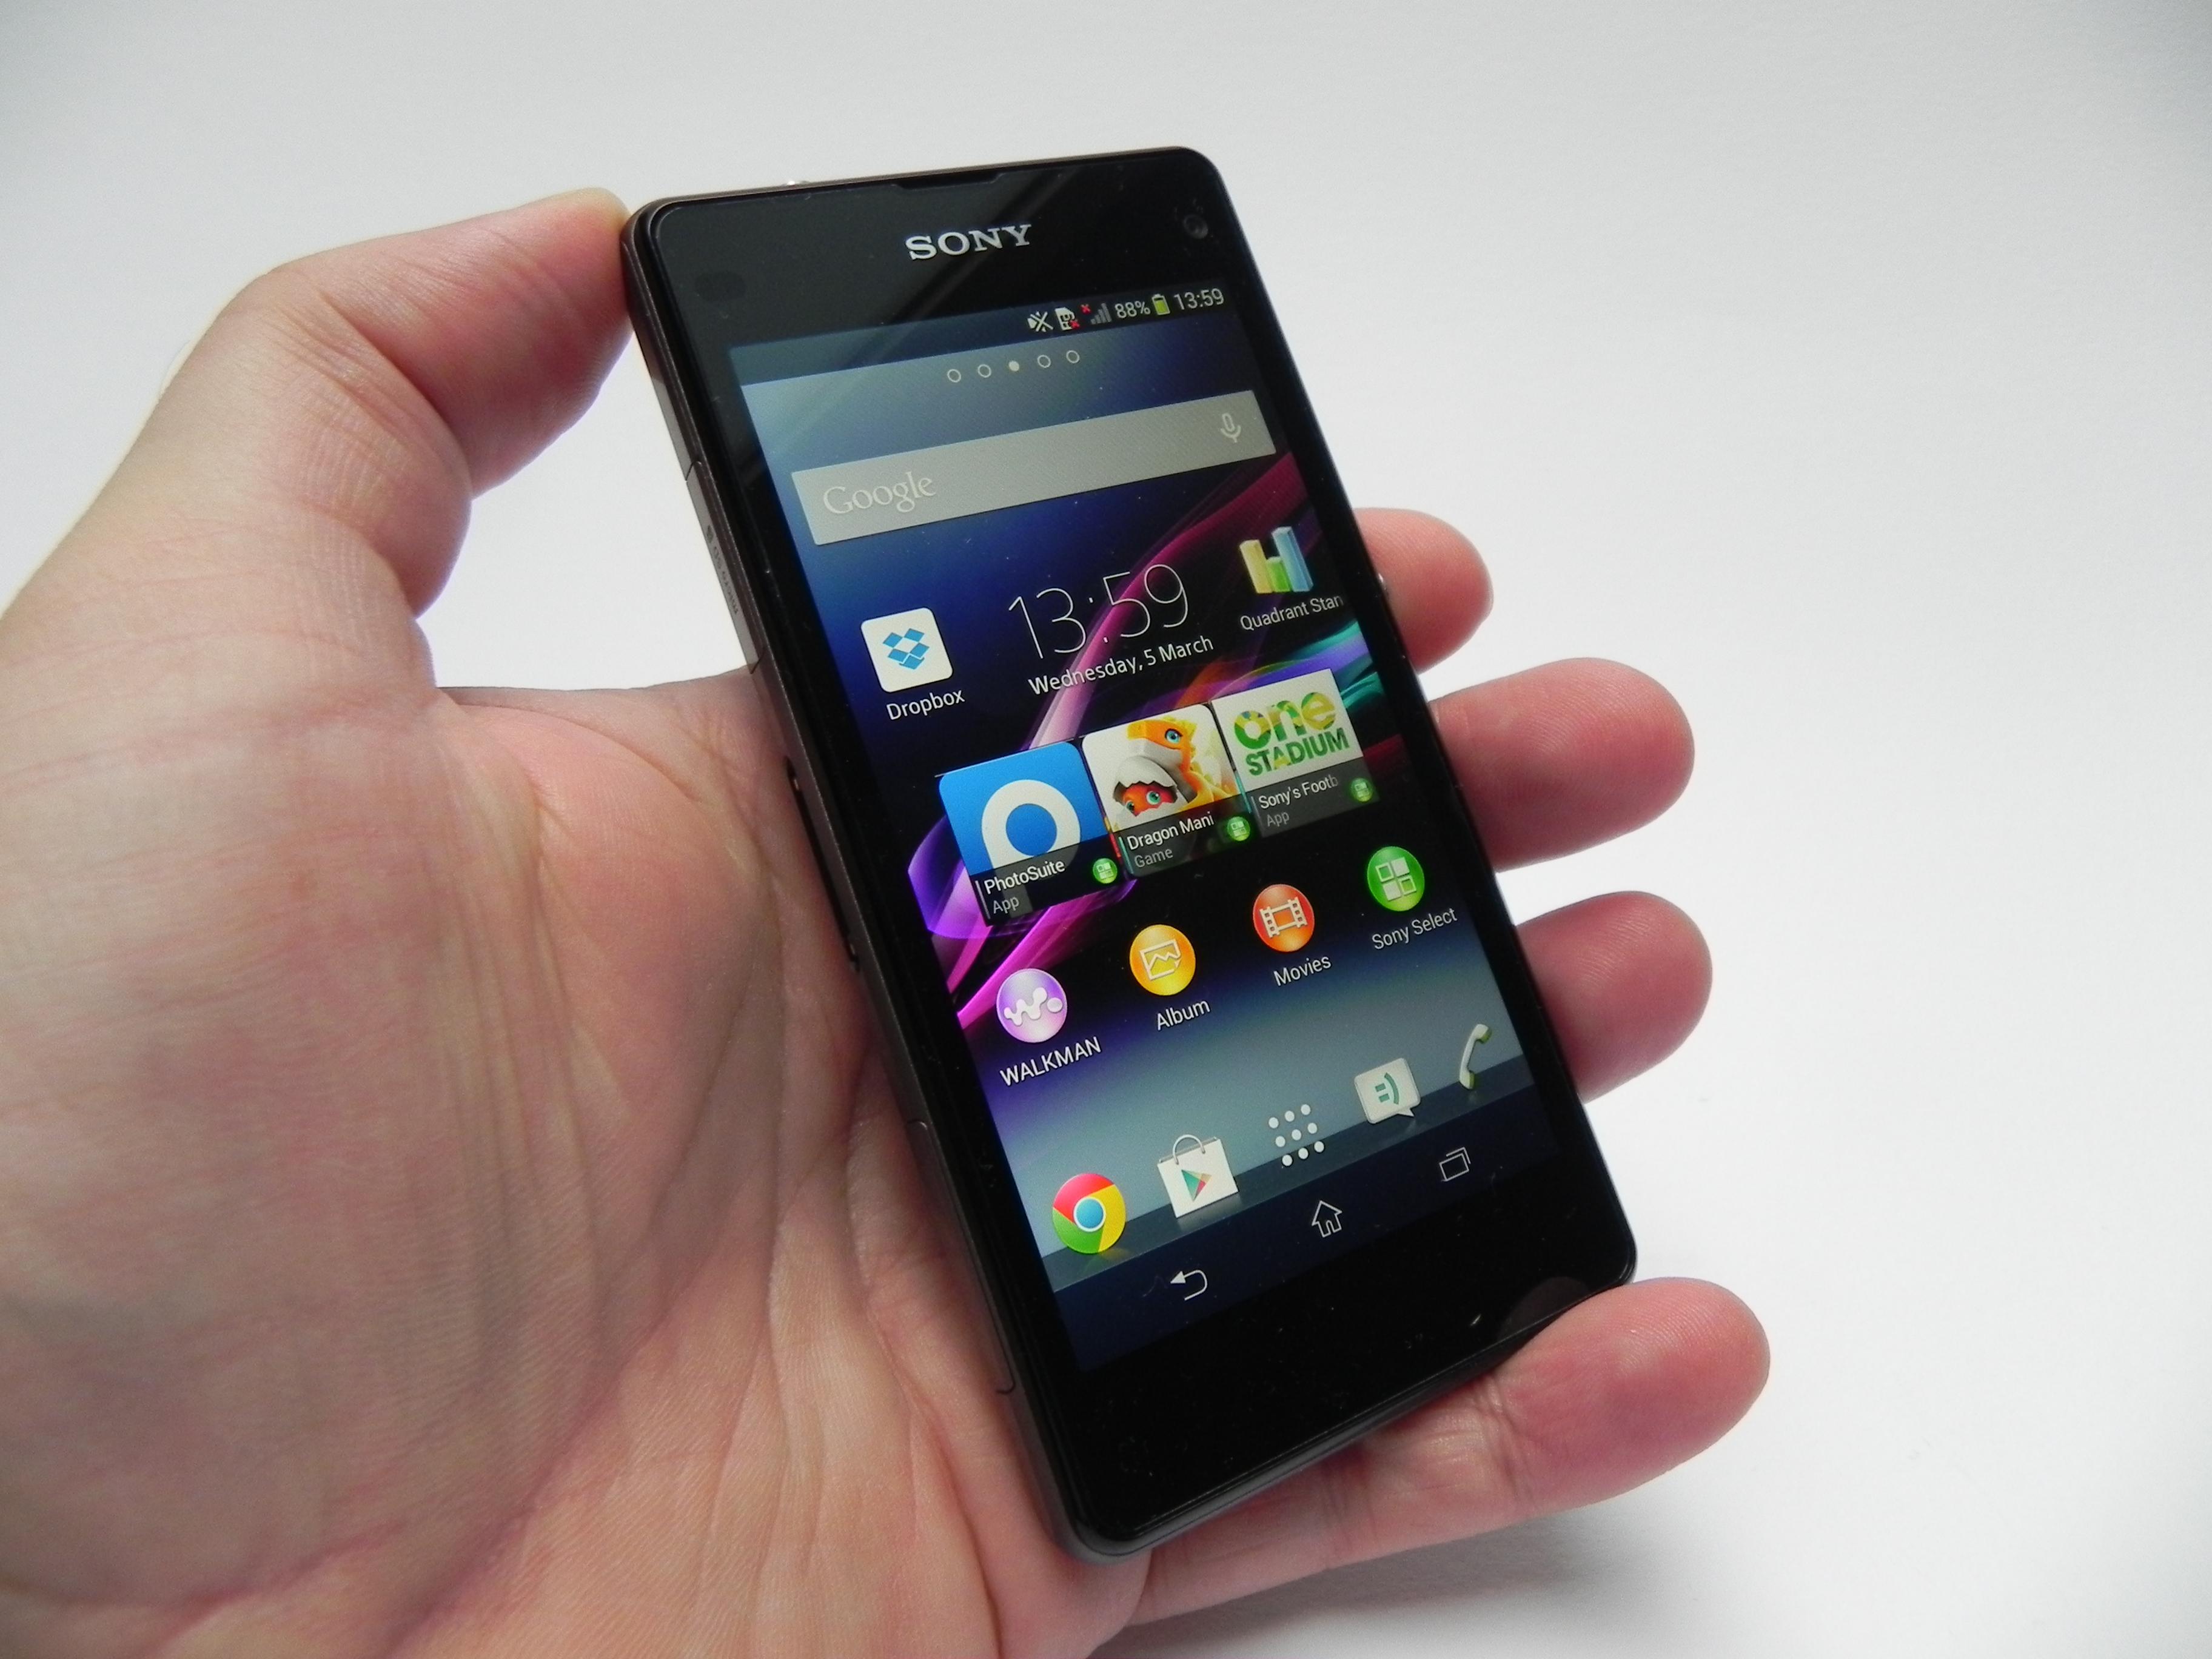 Sony Xperia Z1 Compact D5503 16GB Smartphone 1279-8473.3 B&H  |Sony Xperia Z1 Mini